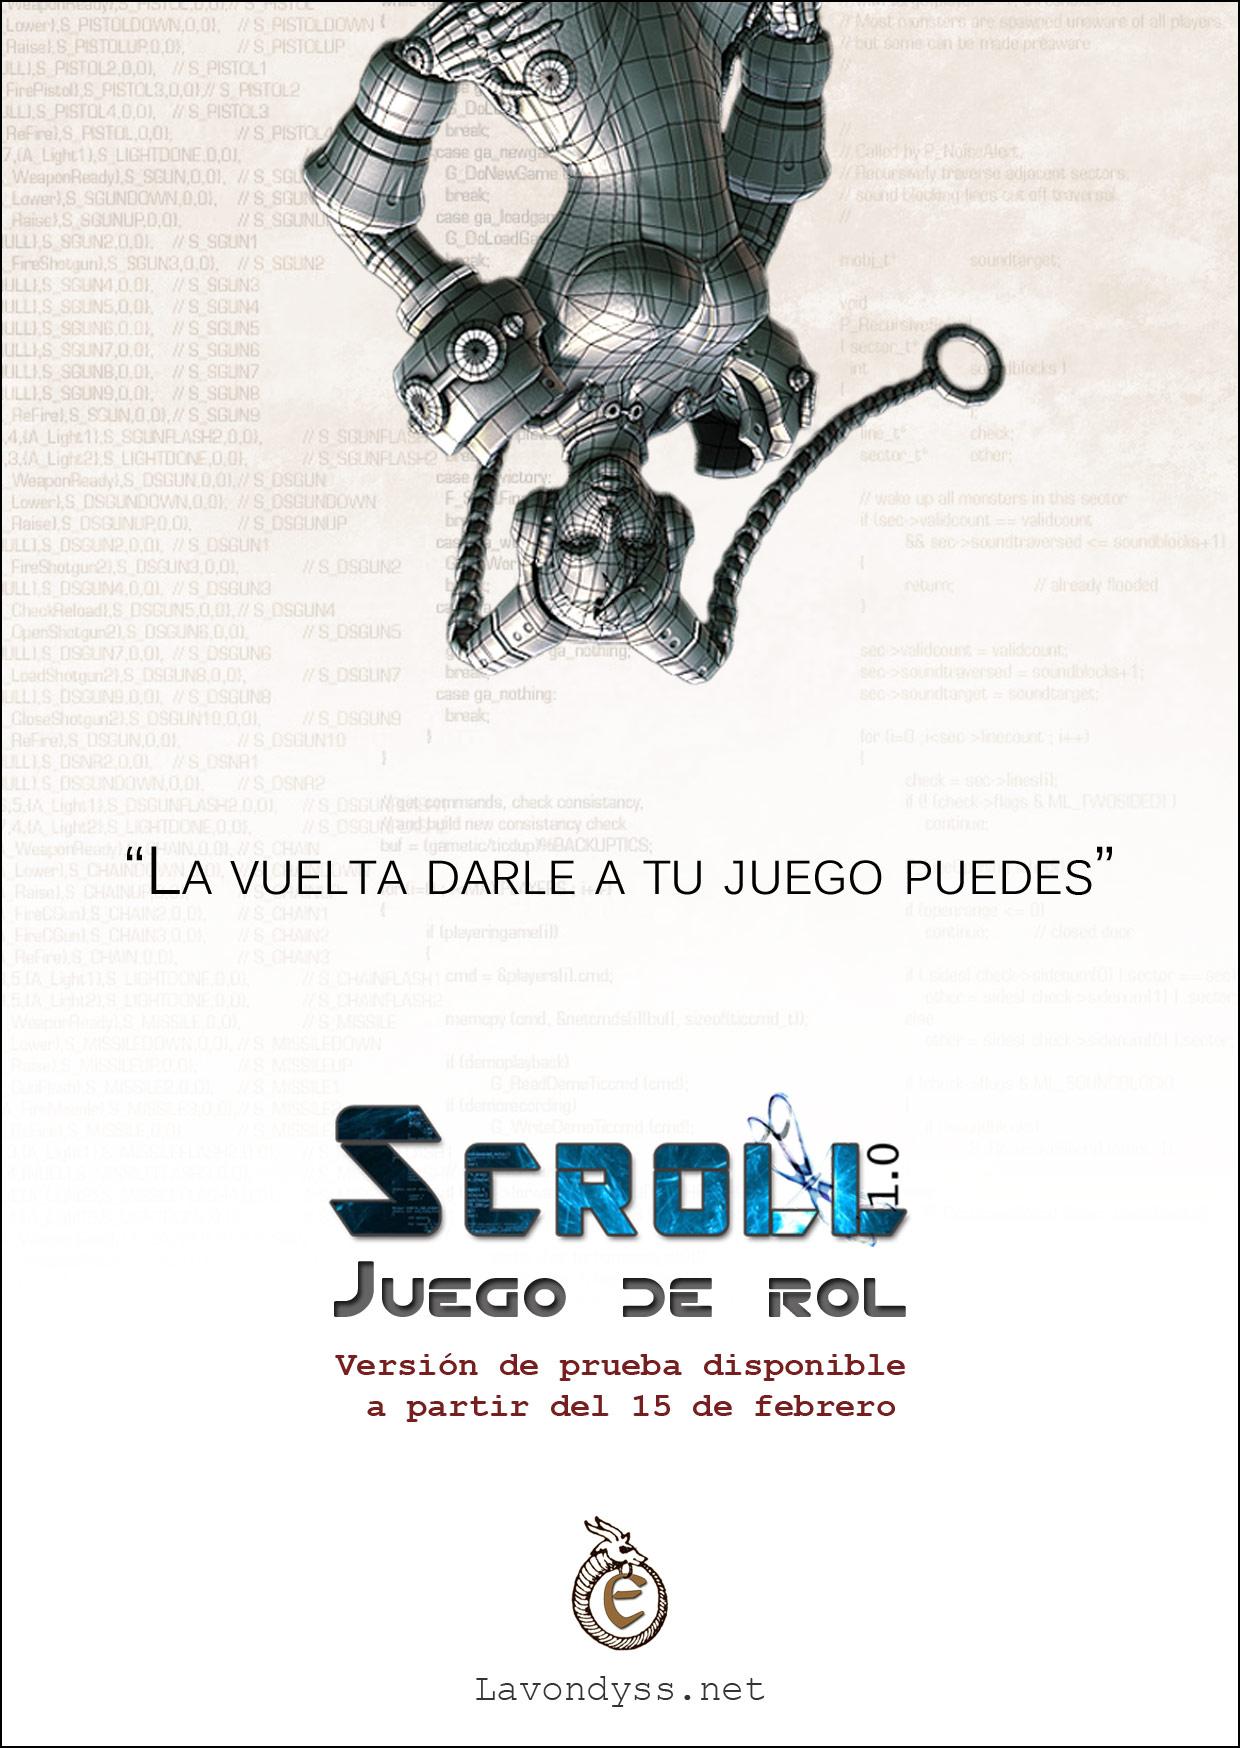 Promoción de Scroll